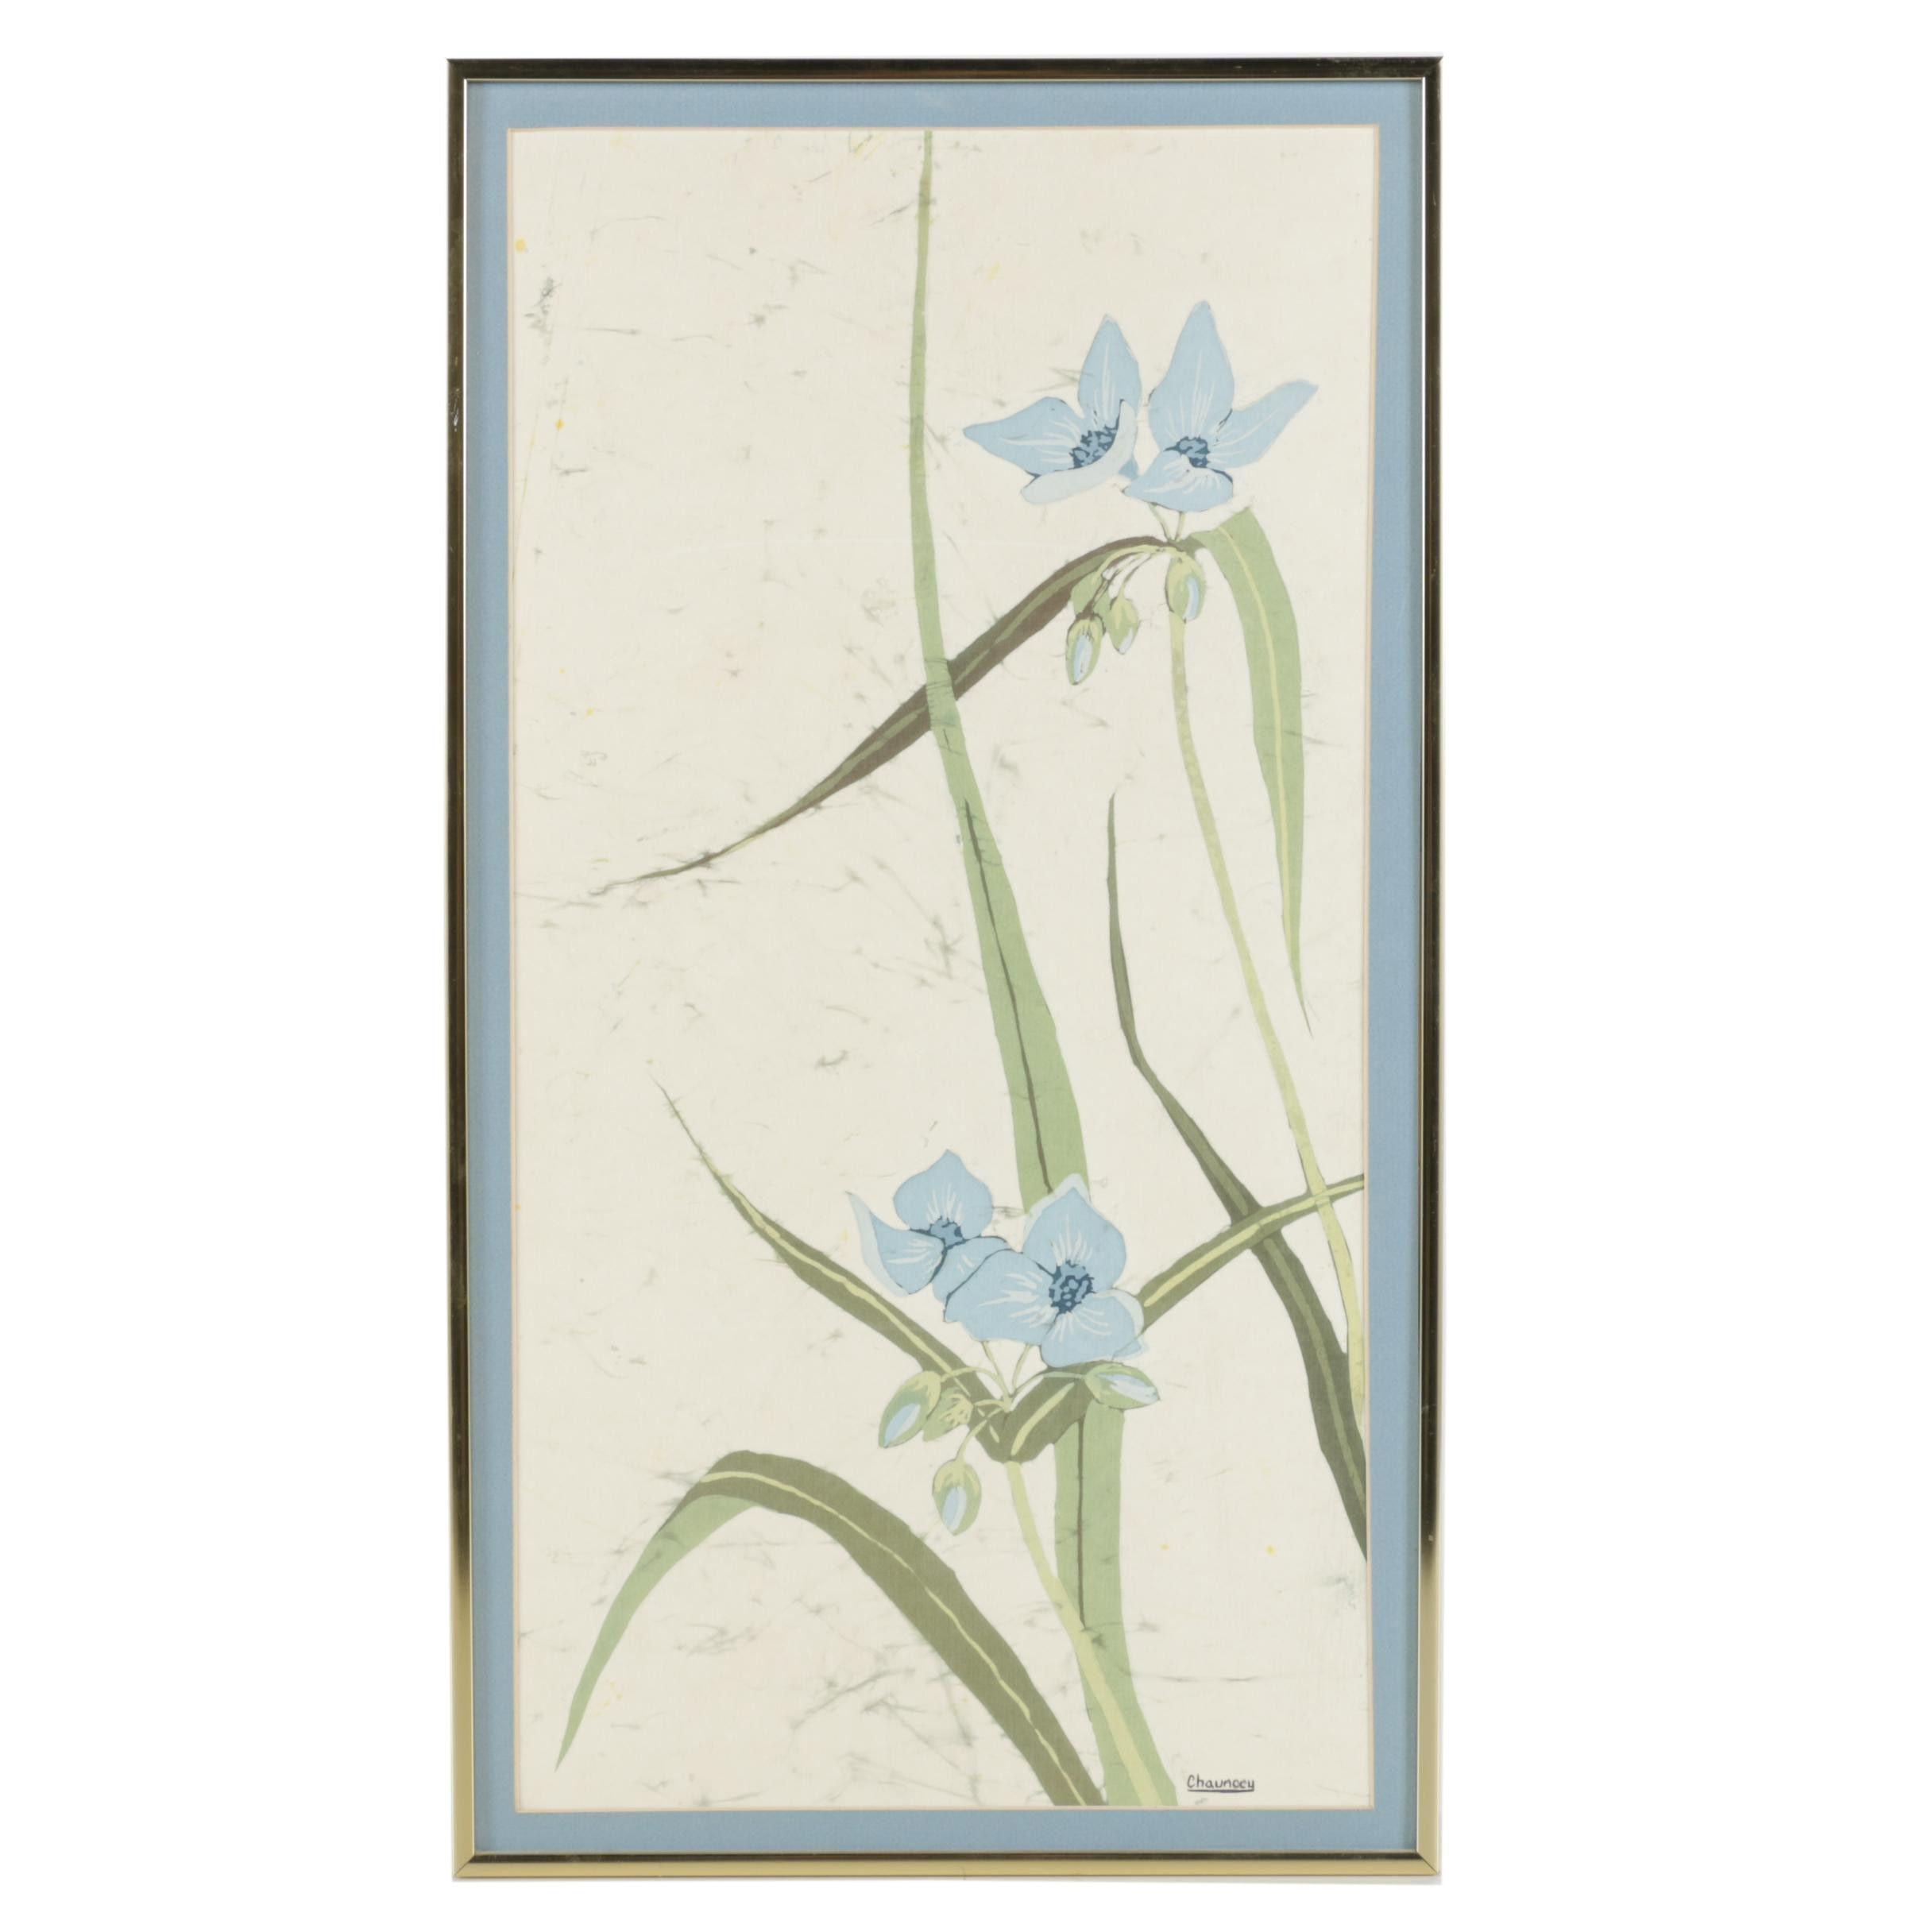 Chauncey Nelson Batik of Flowers